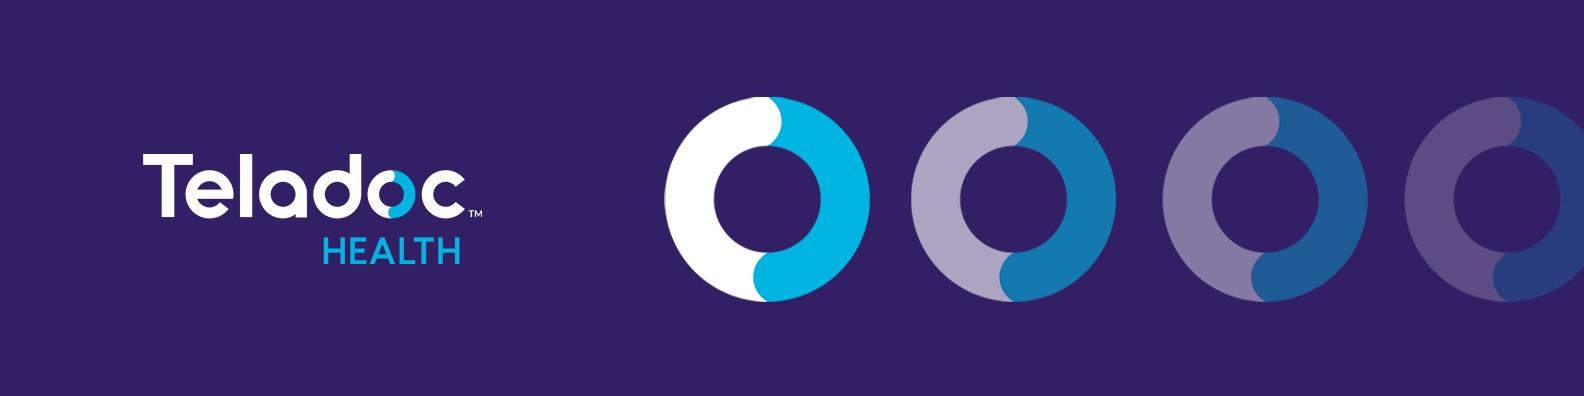 Teladoc Health | LinkedIn